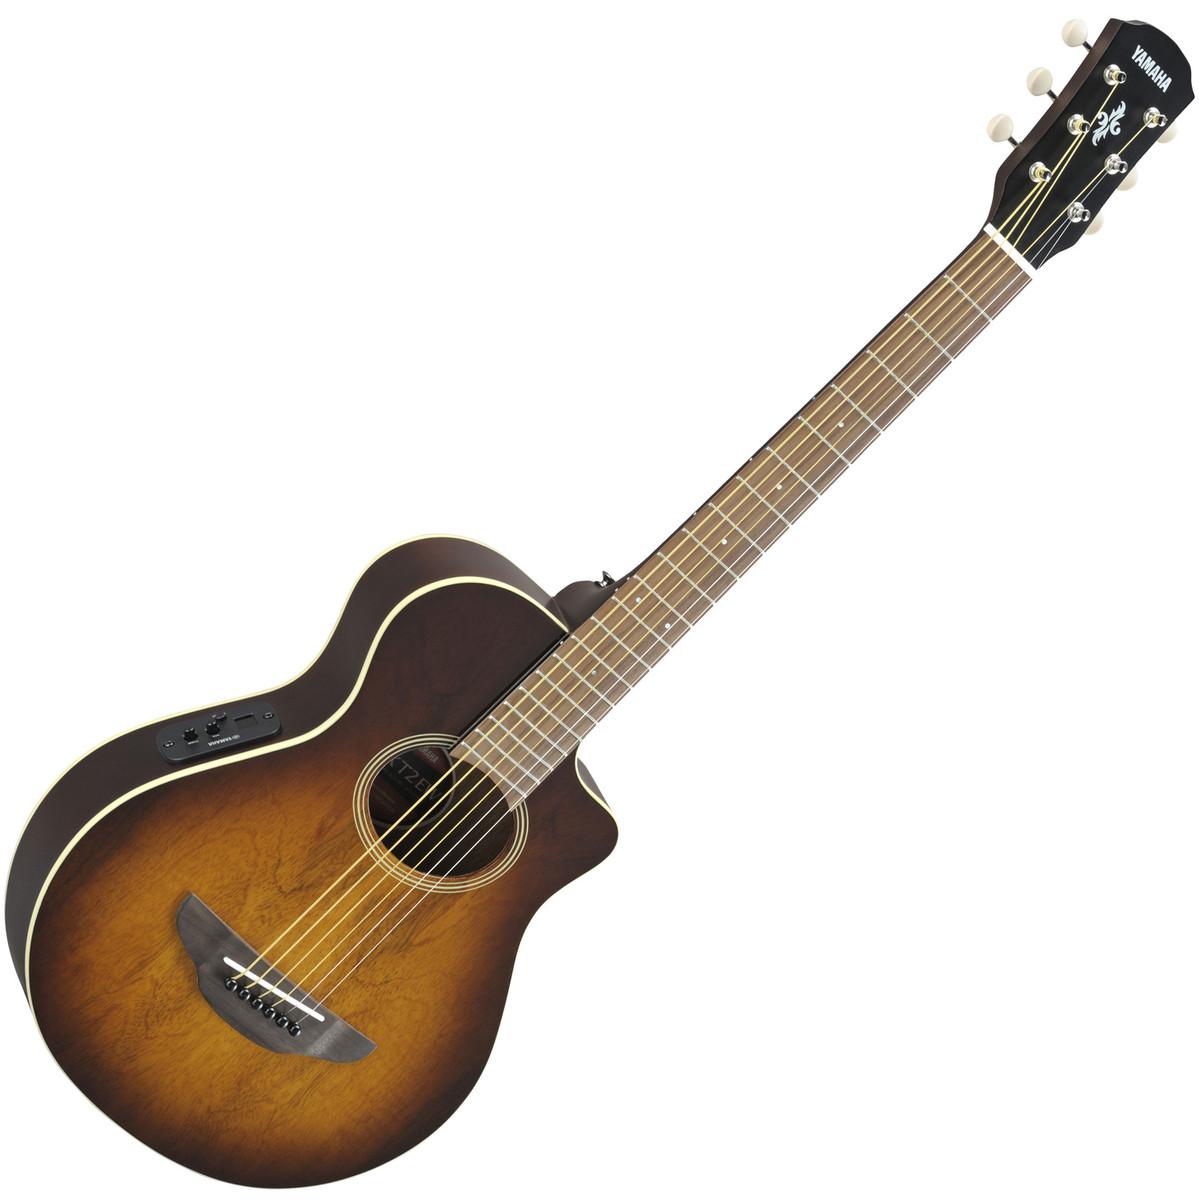 Disc yamaha apxt2ew 3 4 electro acoustic guitar tobacco for Acoustic yamaha guitar